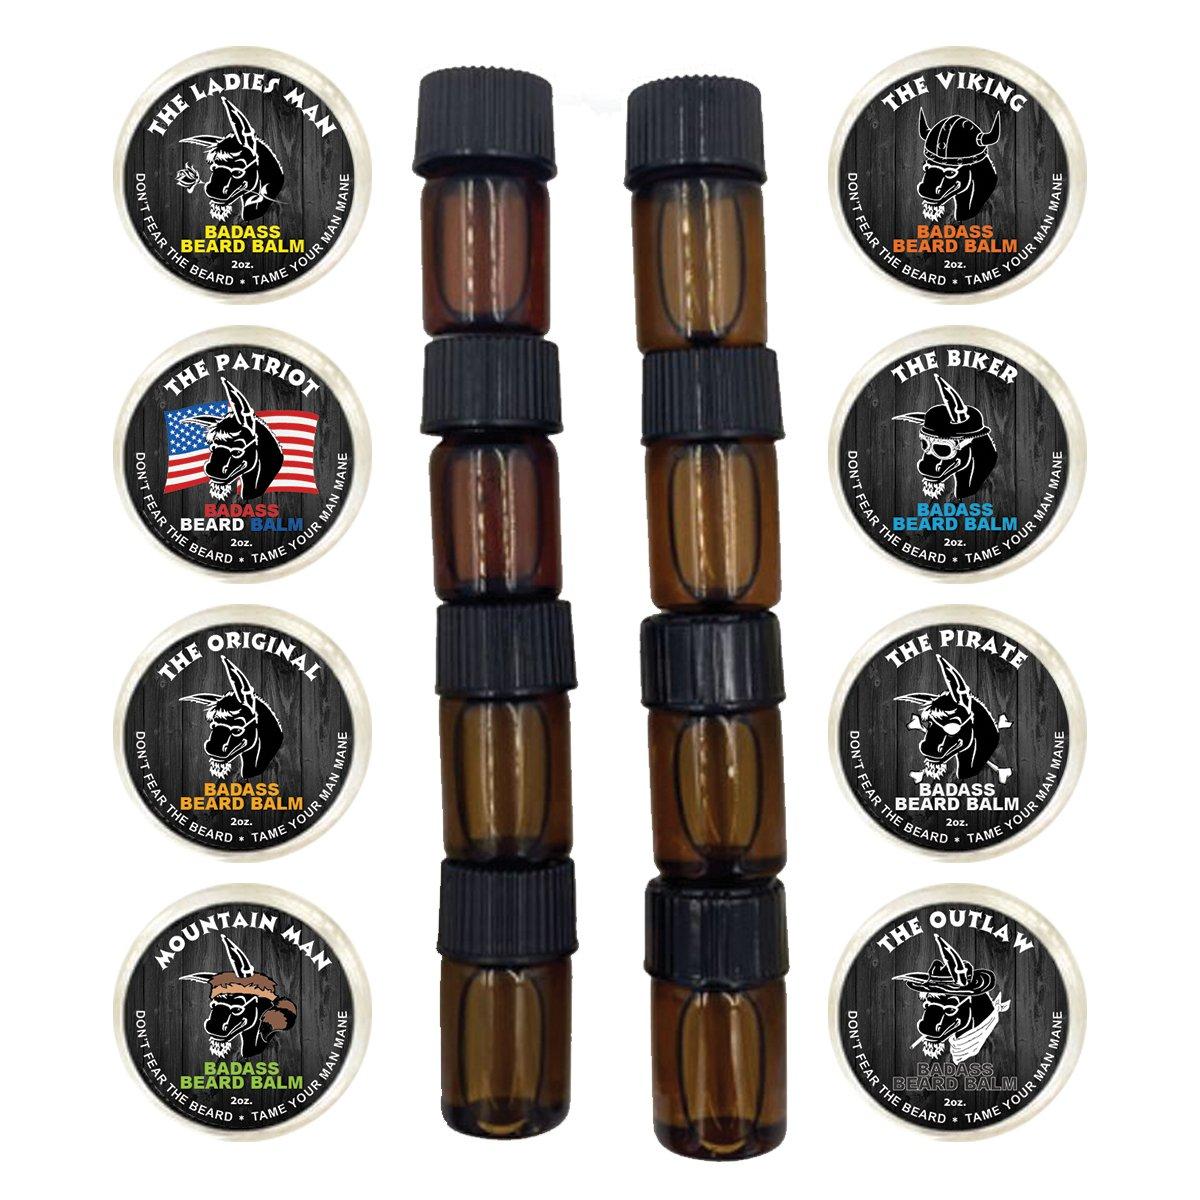 B01HSEQ798 Badass Beard Care Trial Kit For Men - 8 Packs Trial Sizes of Beard Balm & Beard Oil